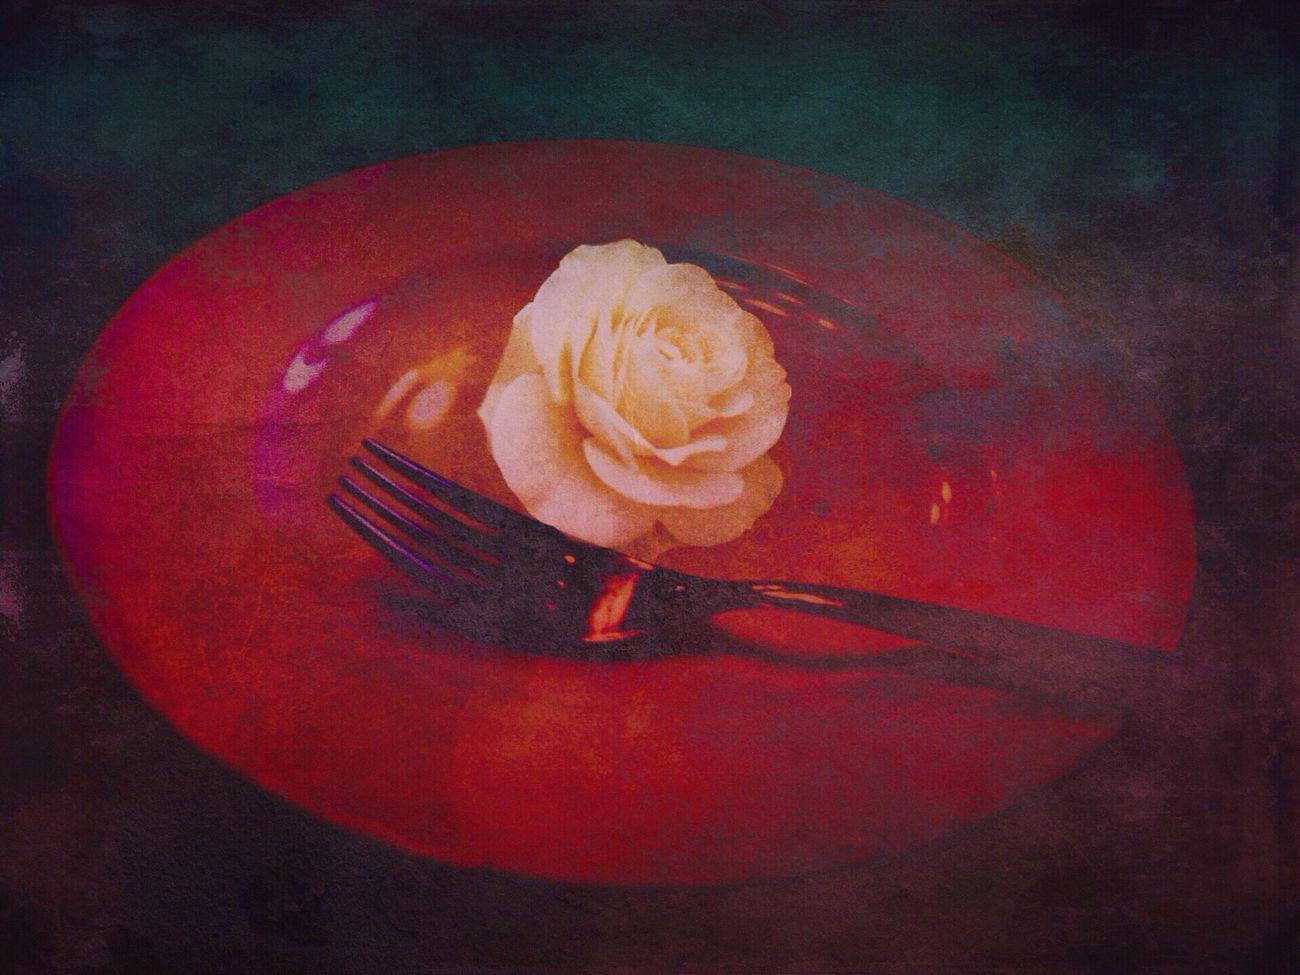 Red Dream DavidLynch 🎶Angelo Badalamenti - Dance of the Dream Man